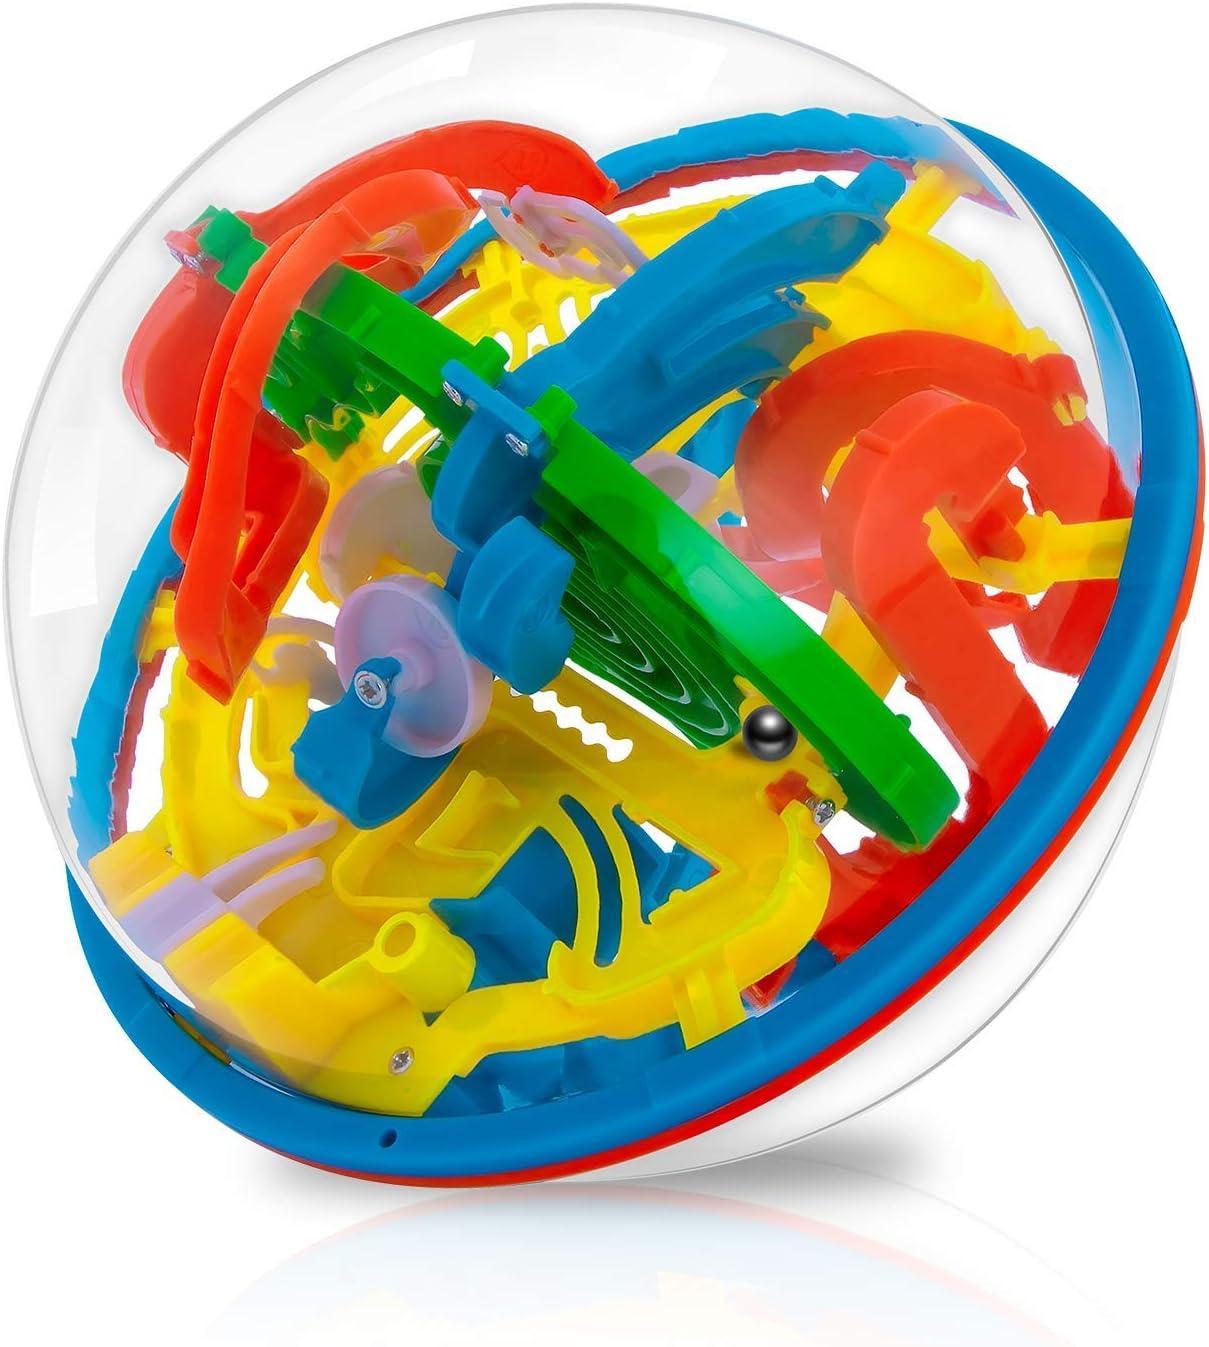 iNeego NEEGO Bola De Laberinto 3D Bola De Intelecto 3D con Desafiantes Bola De Laberinto 3D para NiñOs Rompecabezas 3D Bola De Laberinto MáGico Rompecabezas Juego De Rompecabezas (16cm)